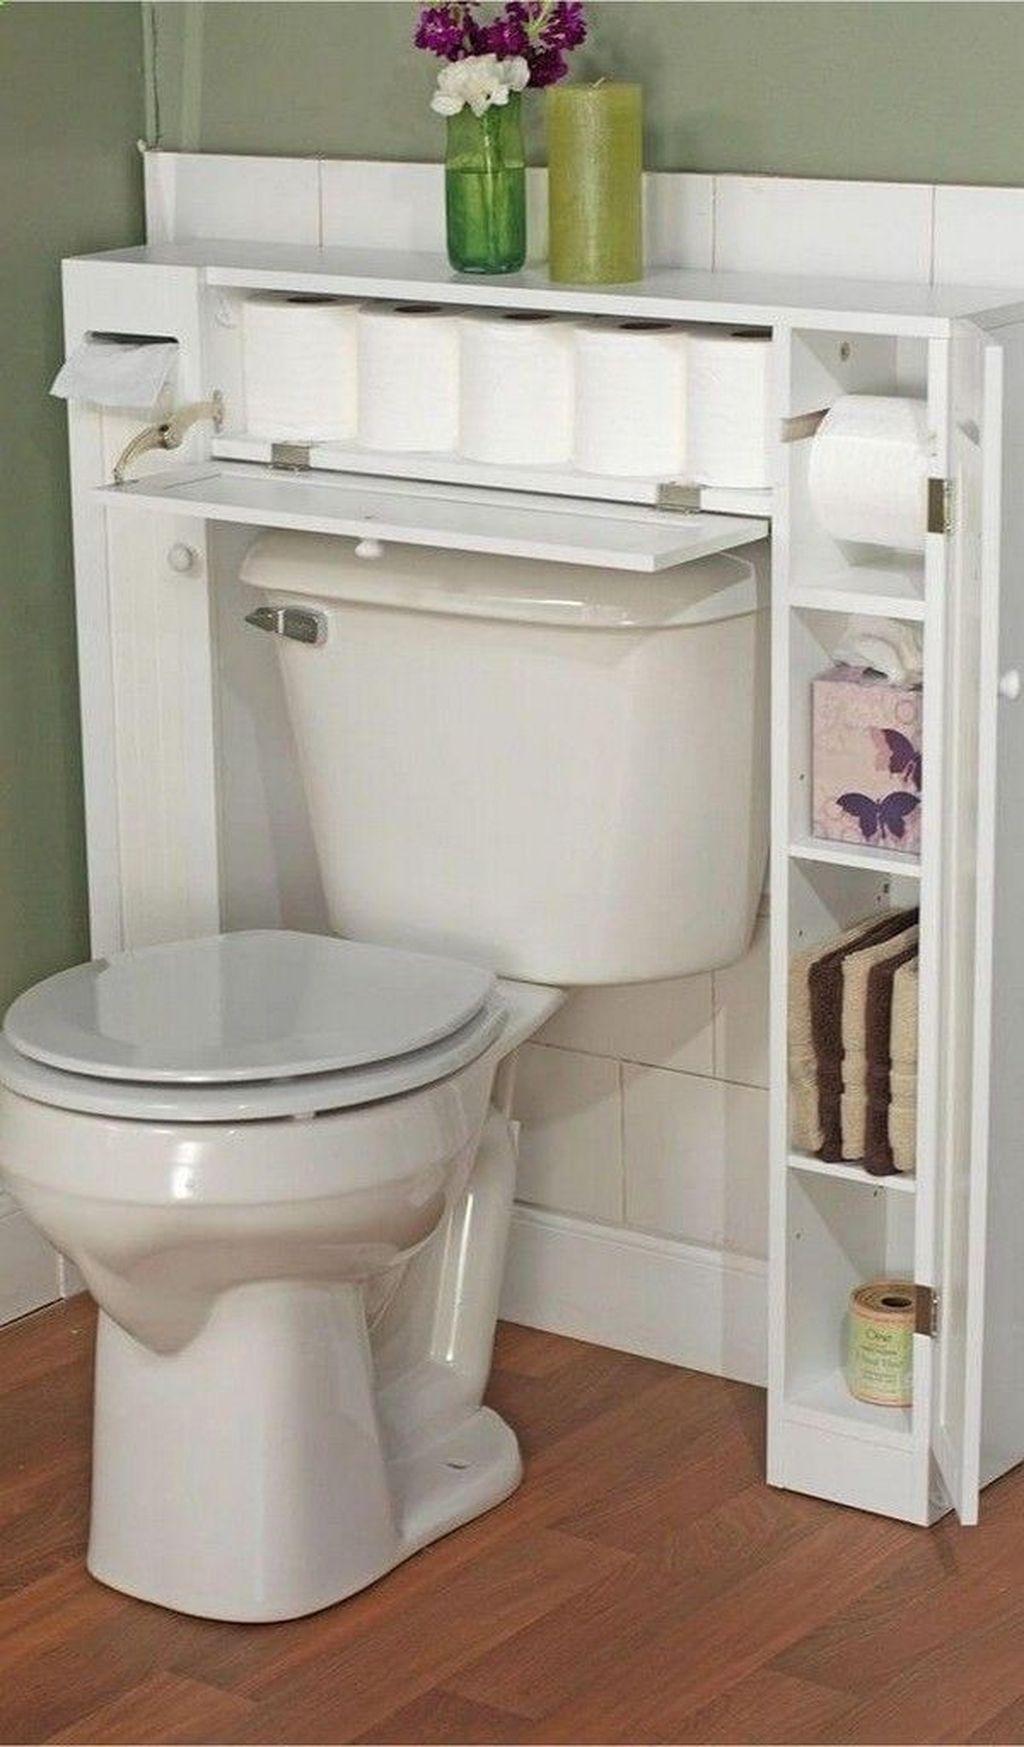 Pin by Tammy J  on Bathroom Items | Bathroom, Home decor, Home